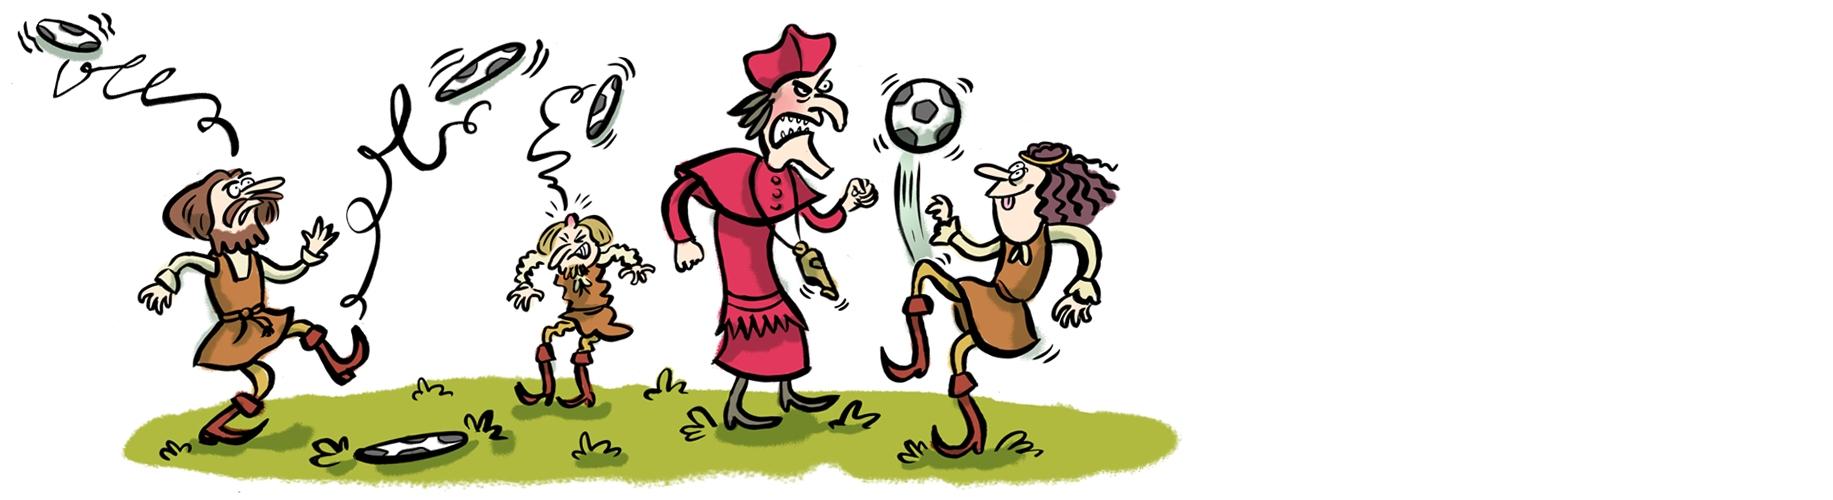 fussball freude karikatur